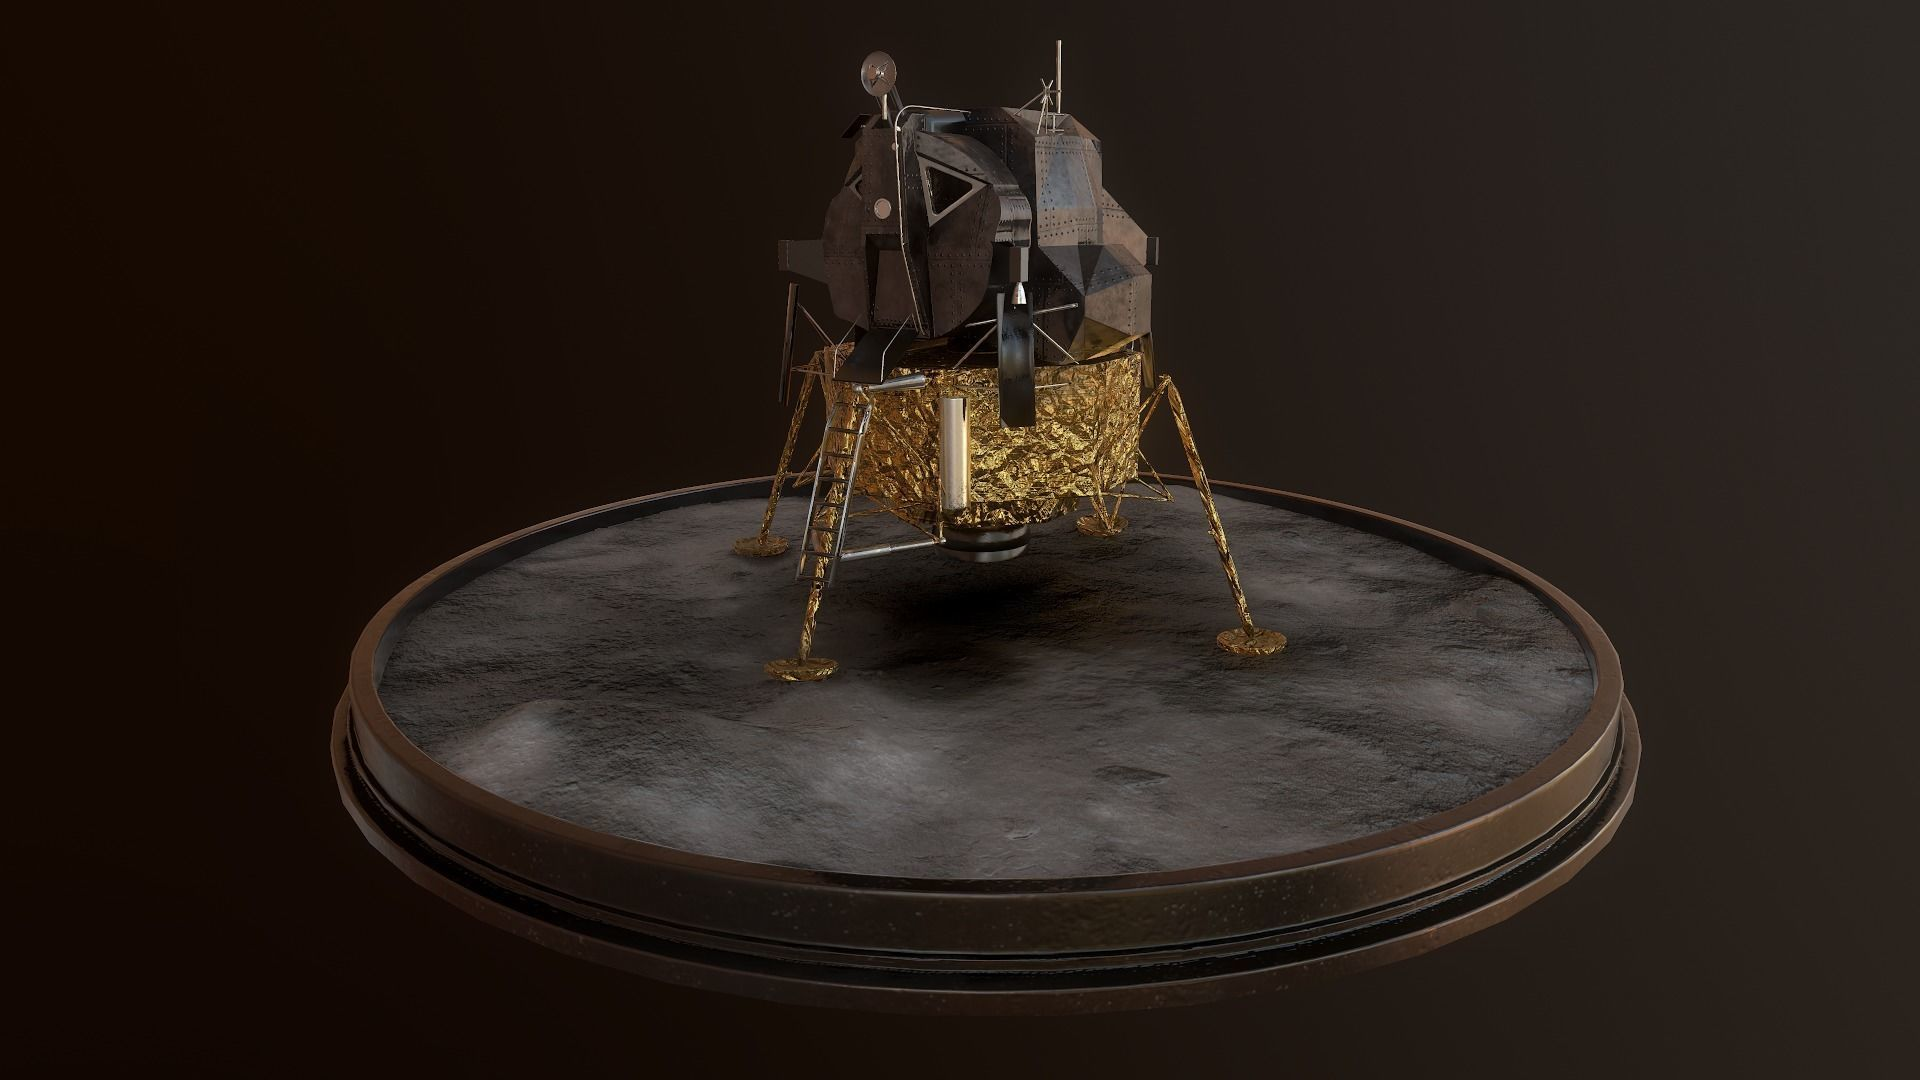 Lunar Module - LEM - Apollo program